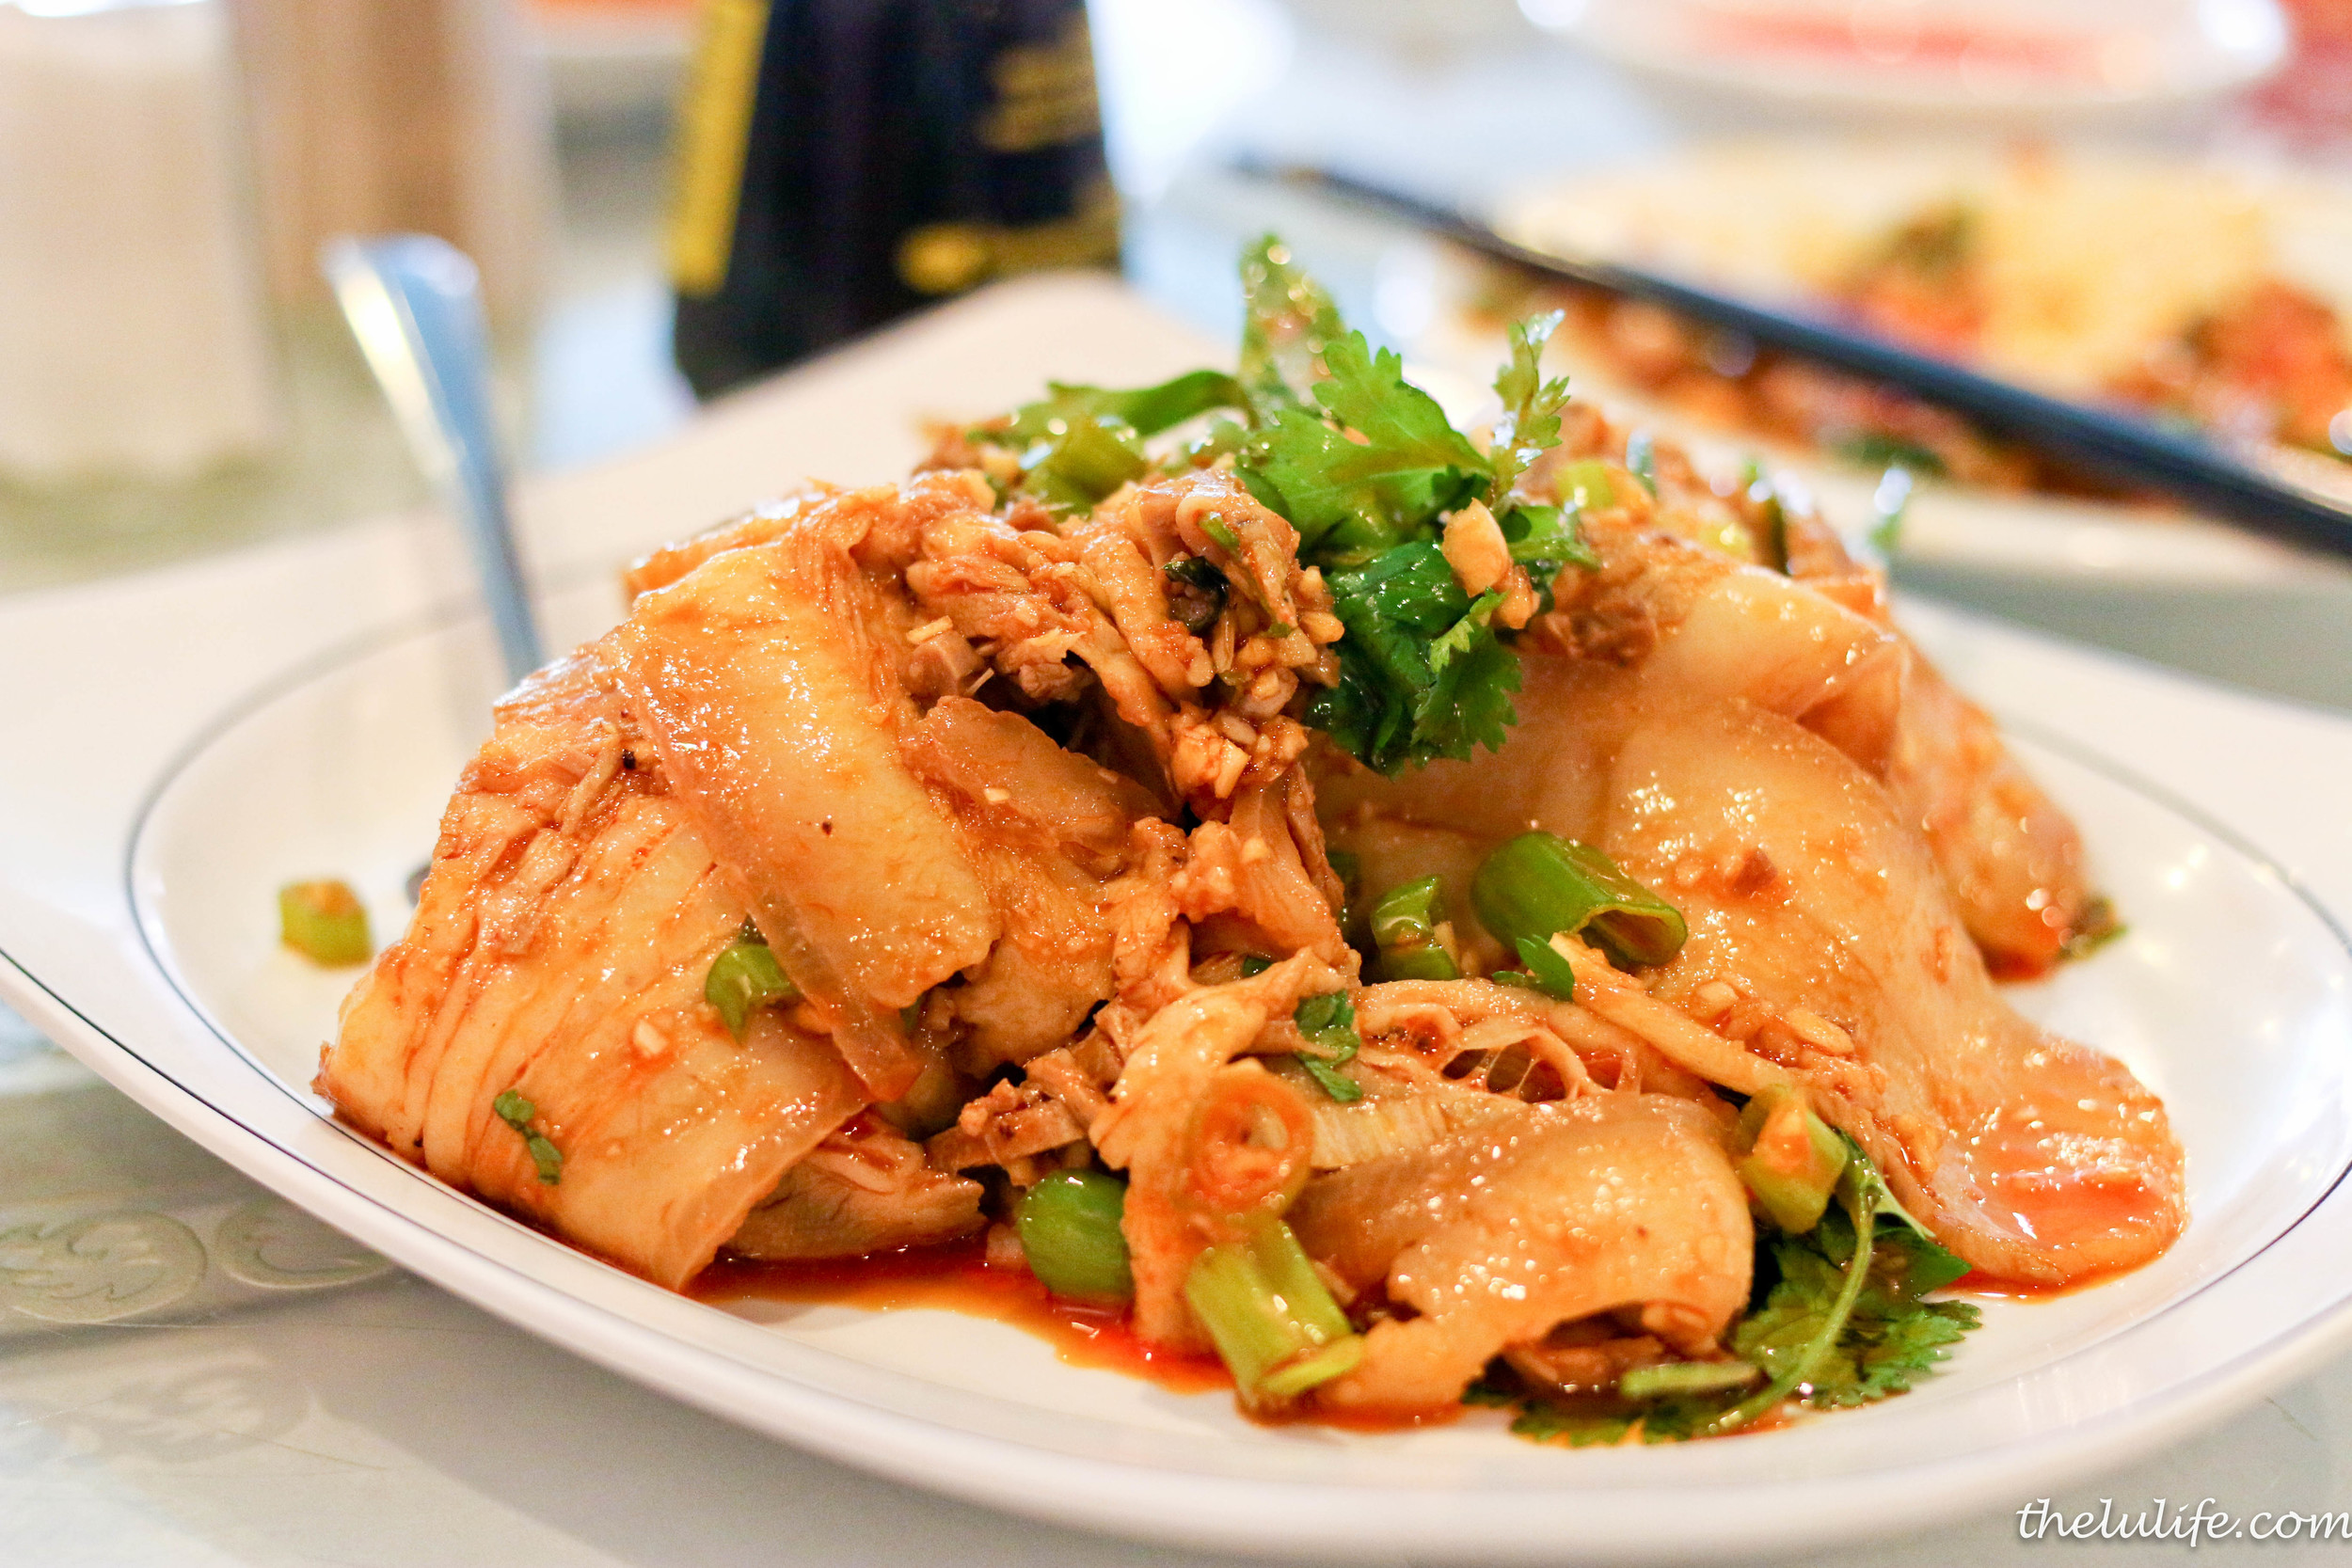 Suan ni bai rou (sliced pork with garlic sauce)